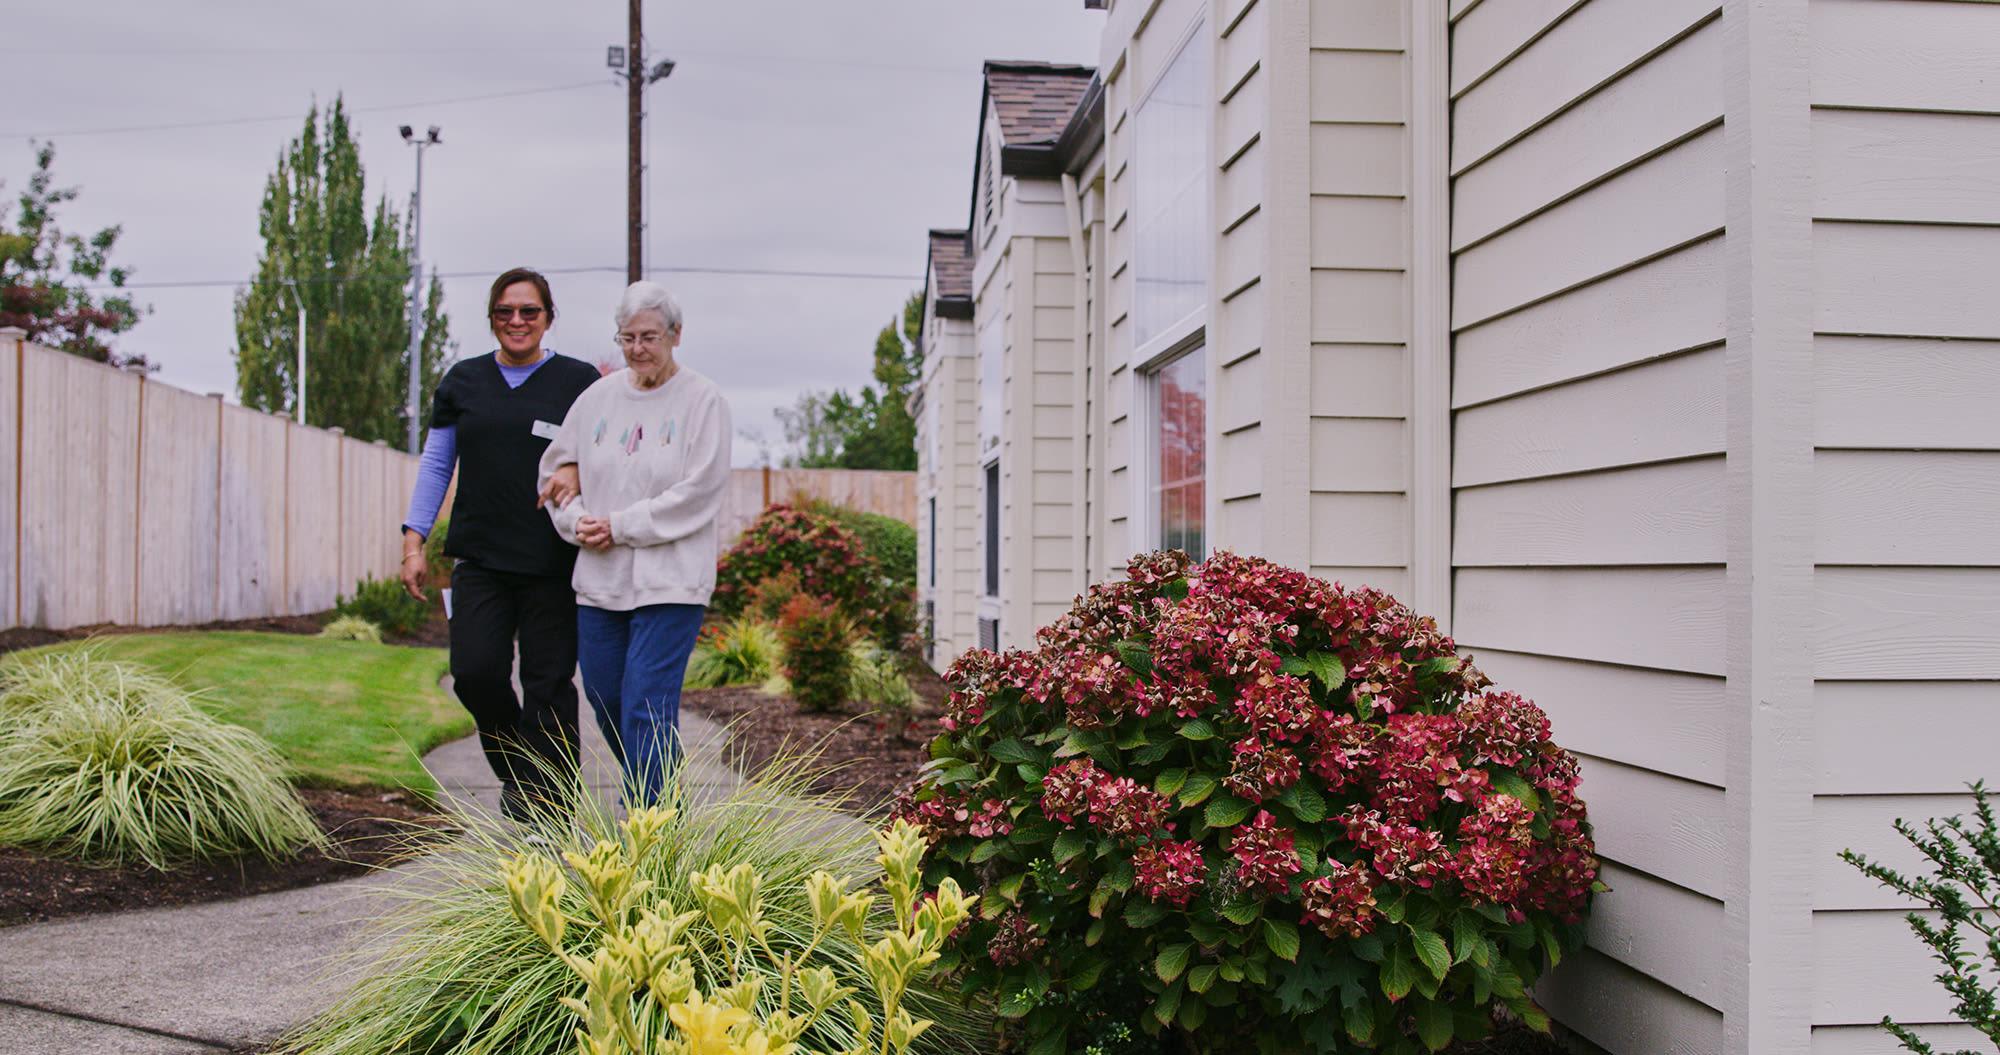 resident and a caretaker walking outside at La Conner Retirement Inn in La Conner, Washington